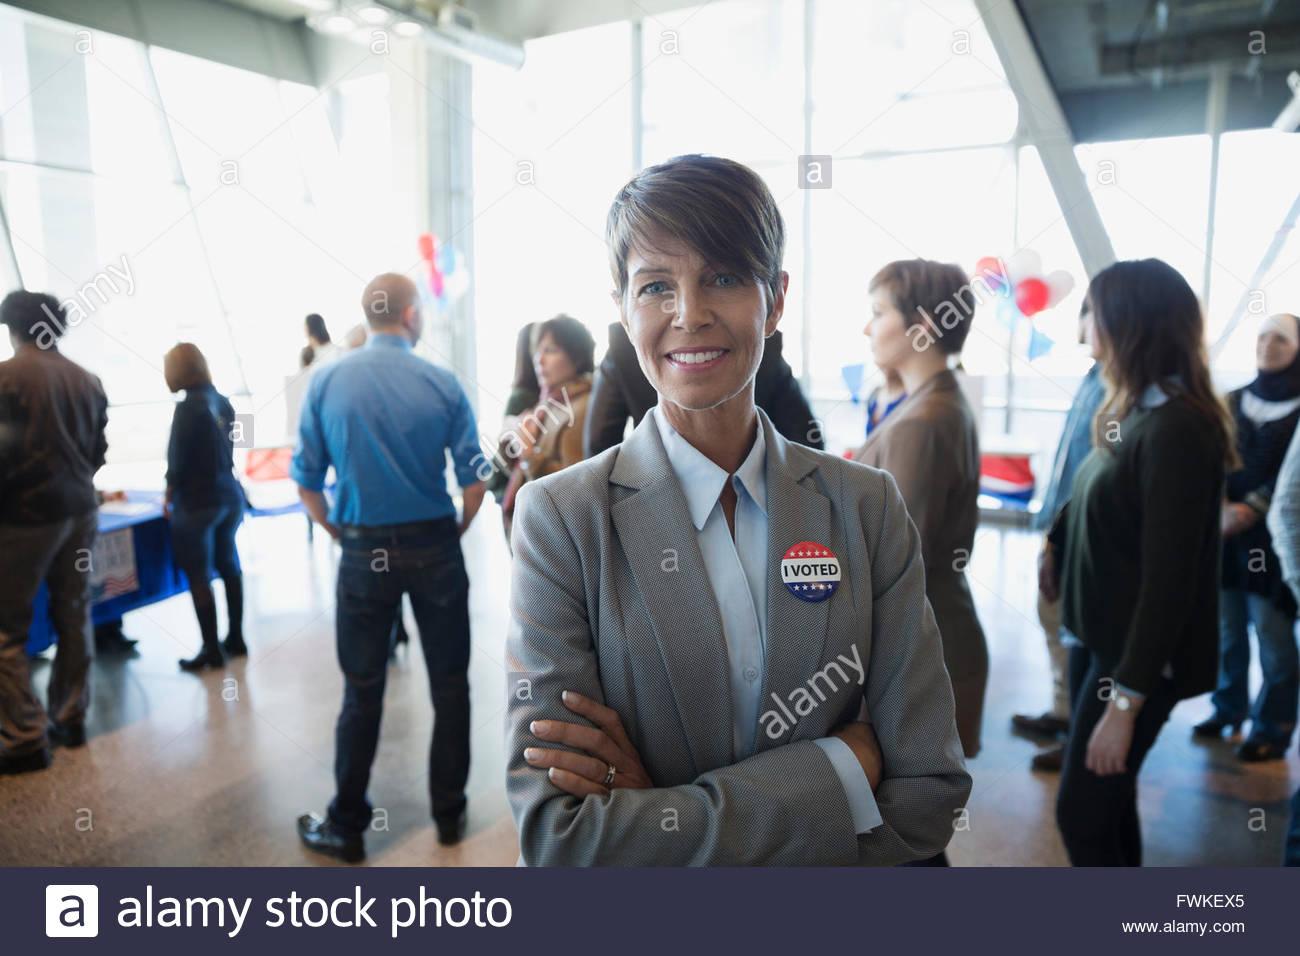 Portrait confident businesswoman at voter polling place - Stock Image